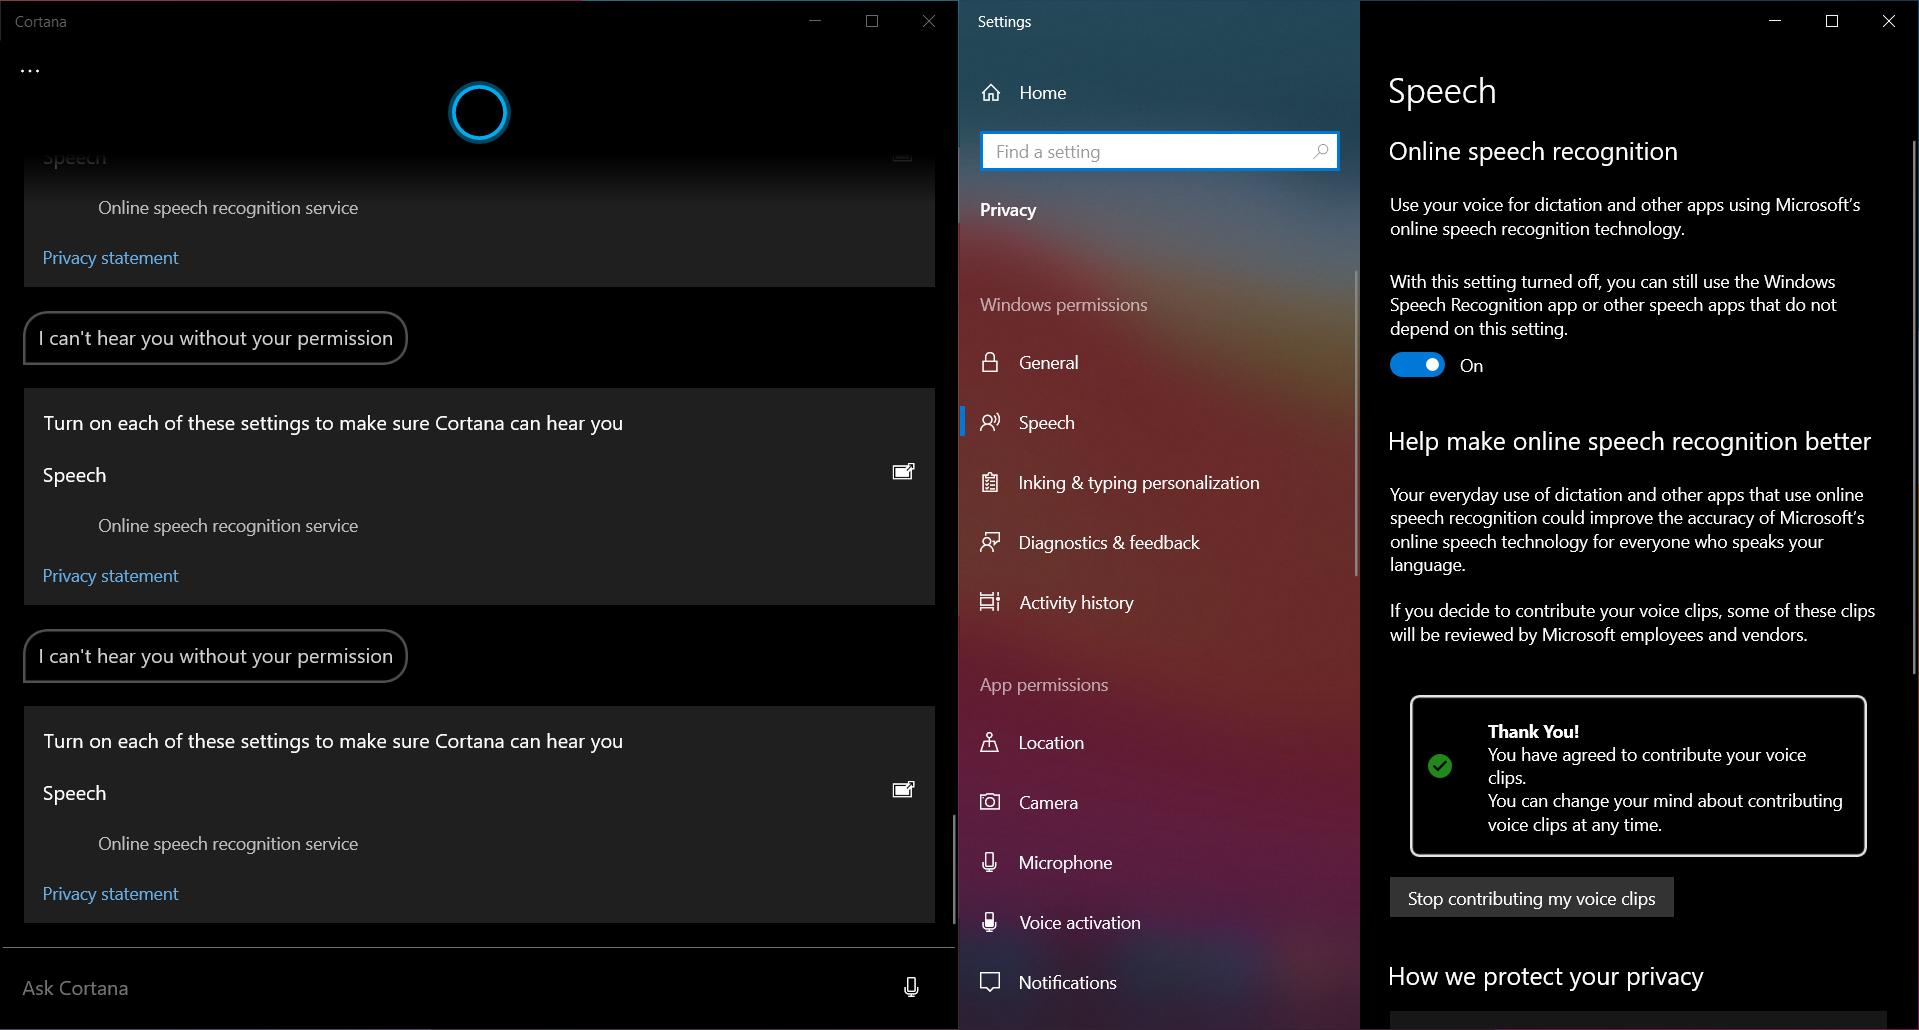 Cortana keep asking me. ab418f96-7e6c-4f2b-9434-7c290e9bbde3?upload=true.png